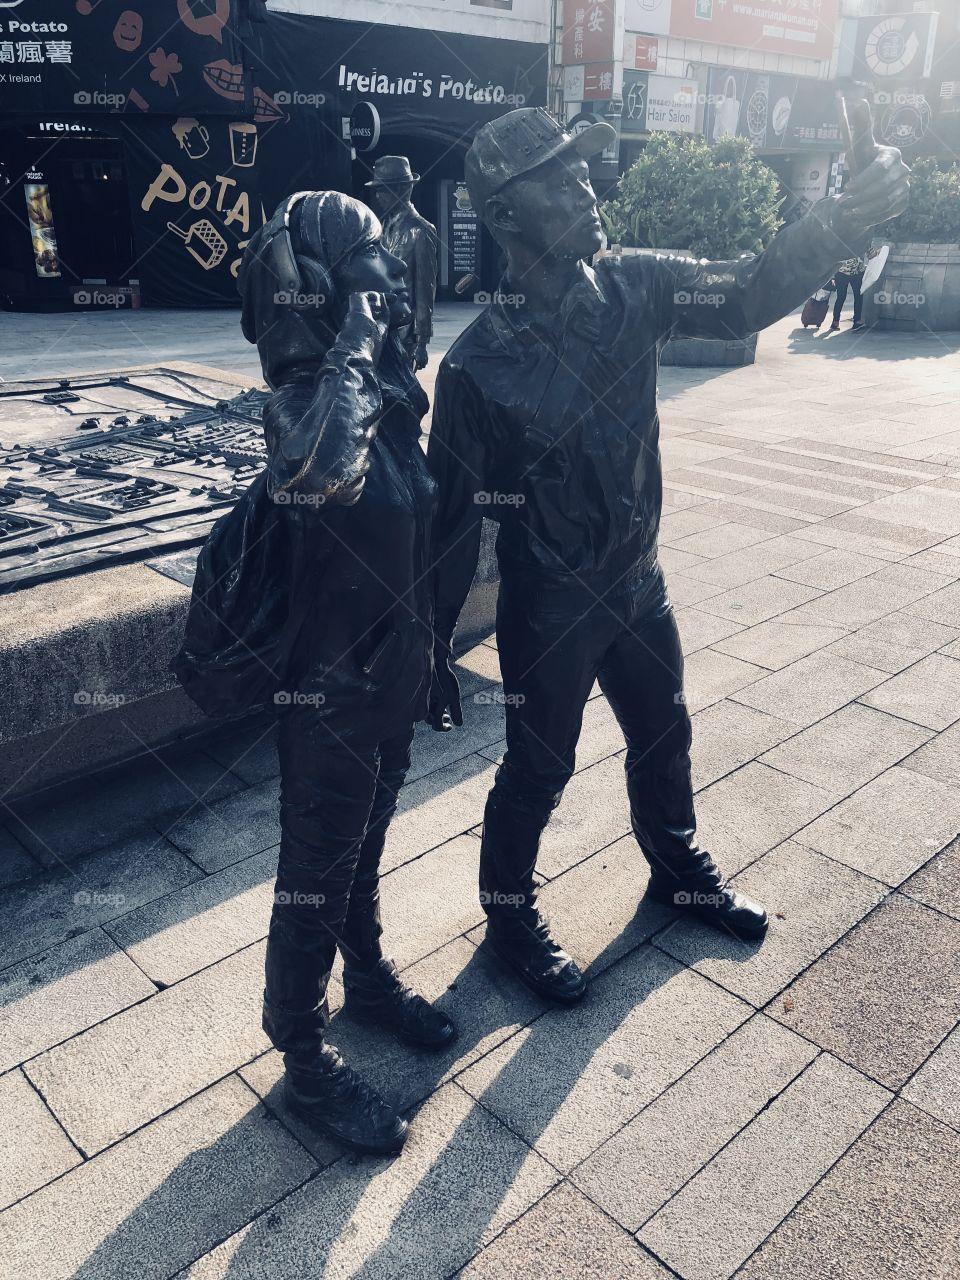 U shot I shot #sefie #selfie #taipei #taiwan #2018 #環島 #單車環島 #sony6500 #台灣 #西門町 #couple #自拍 #xiementingtaipei